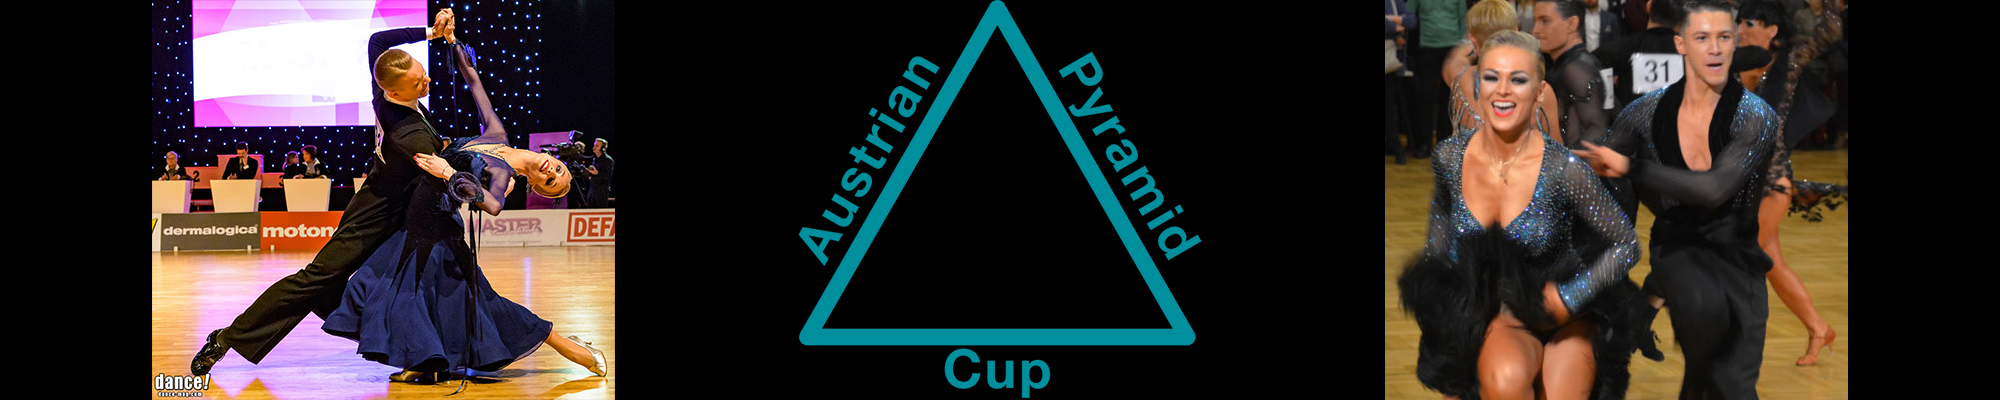 Austrian Pyramid Cup 2019